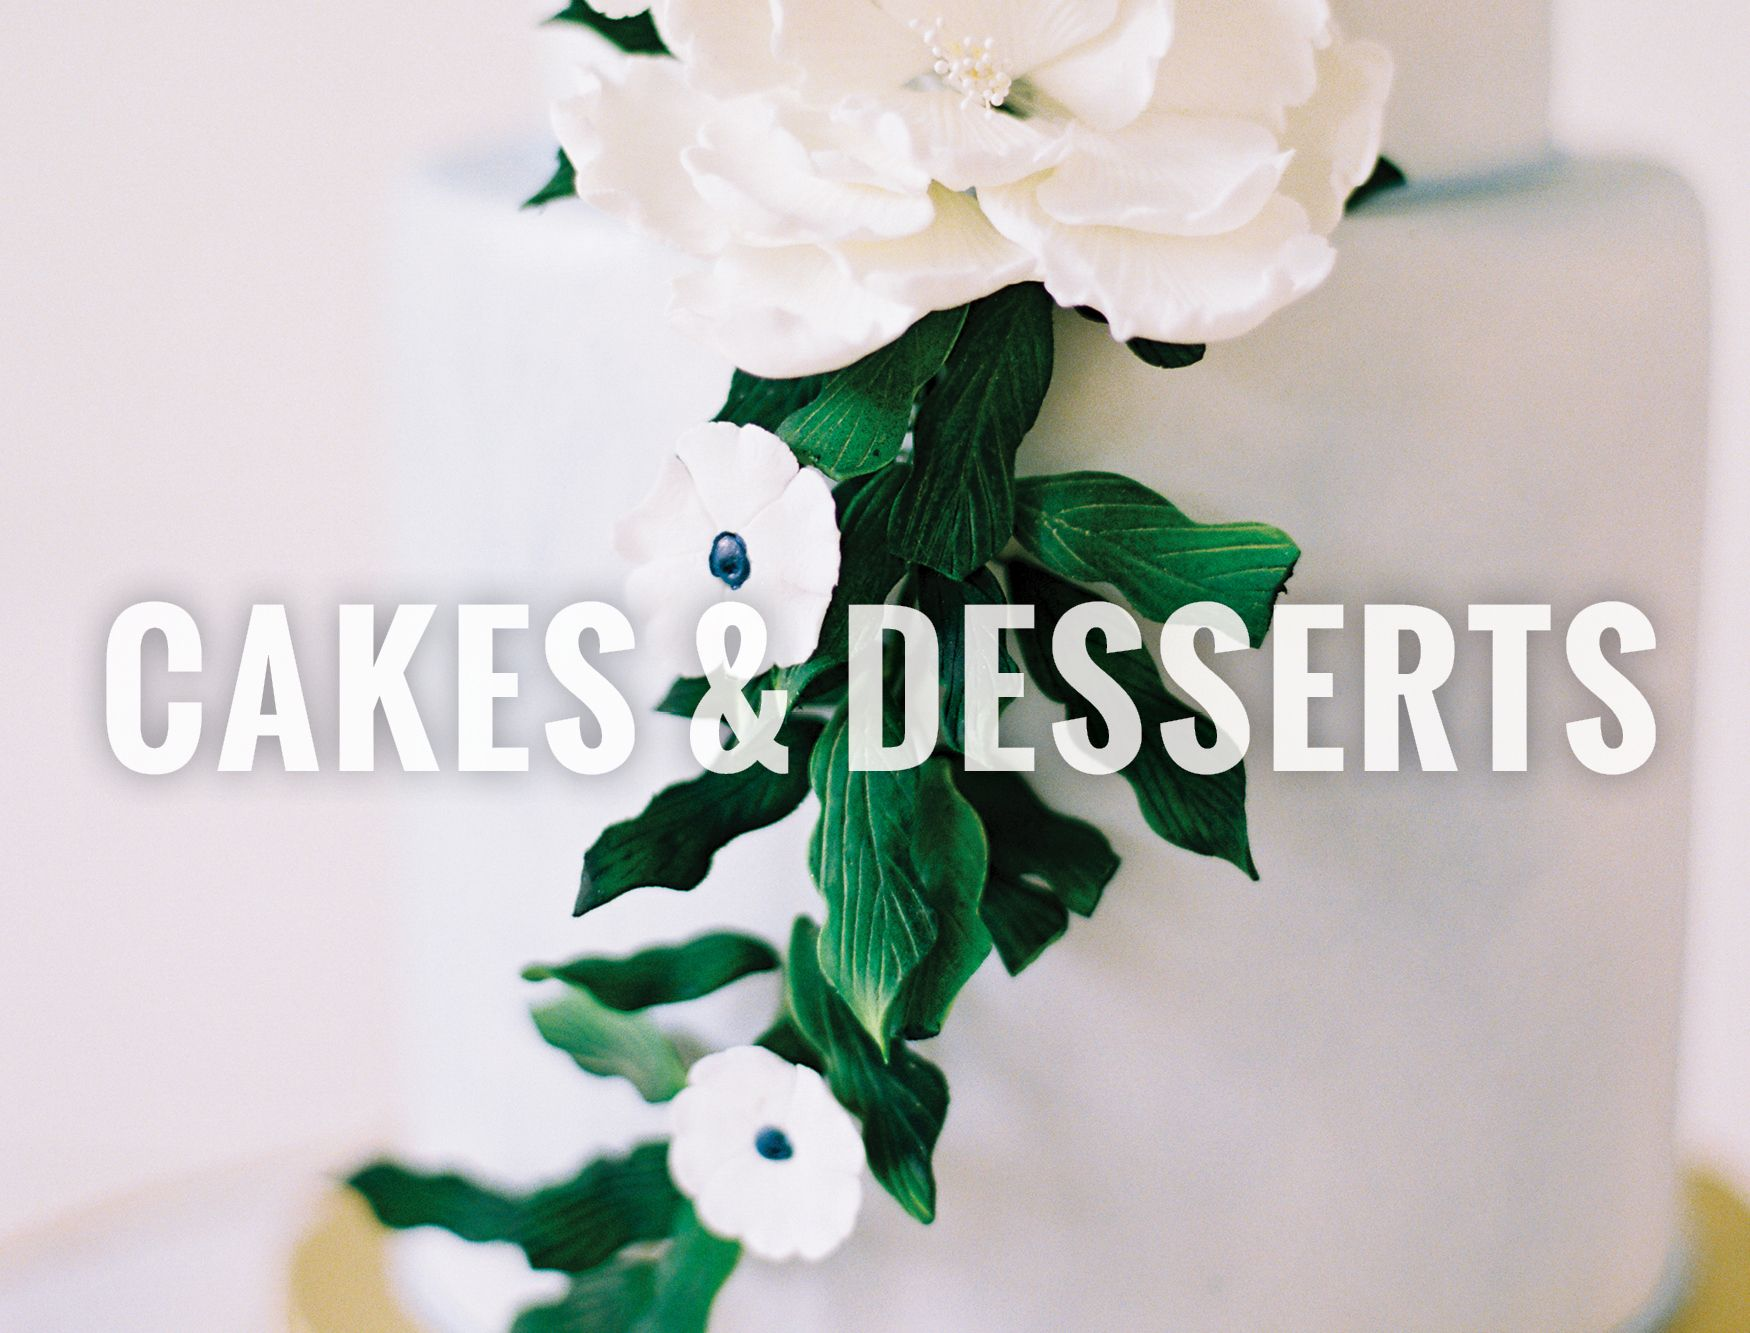 North Texas Wedding Cakes & Desserts